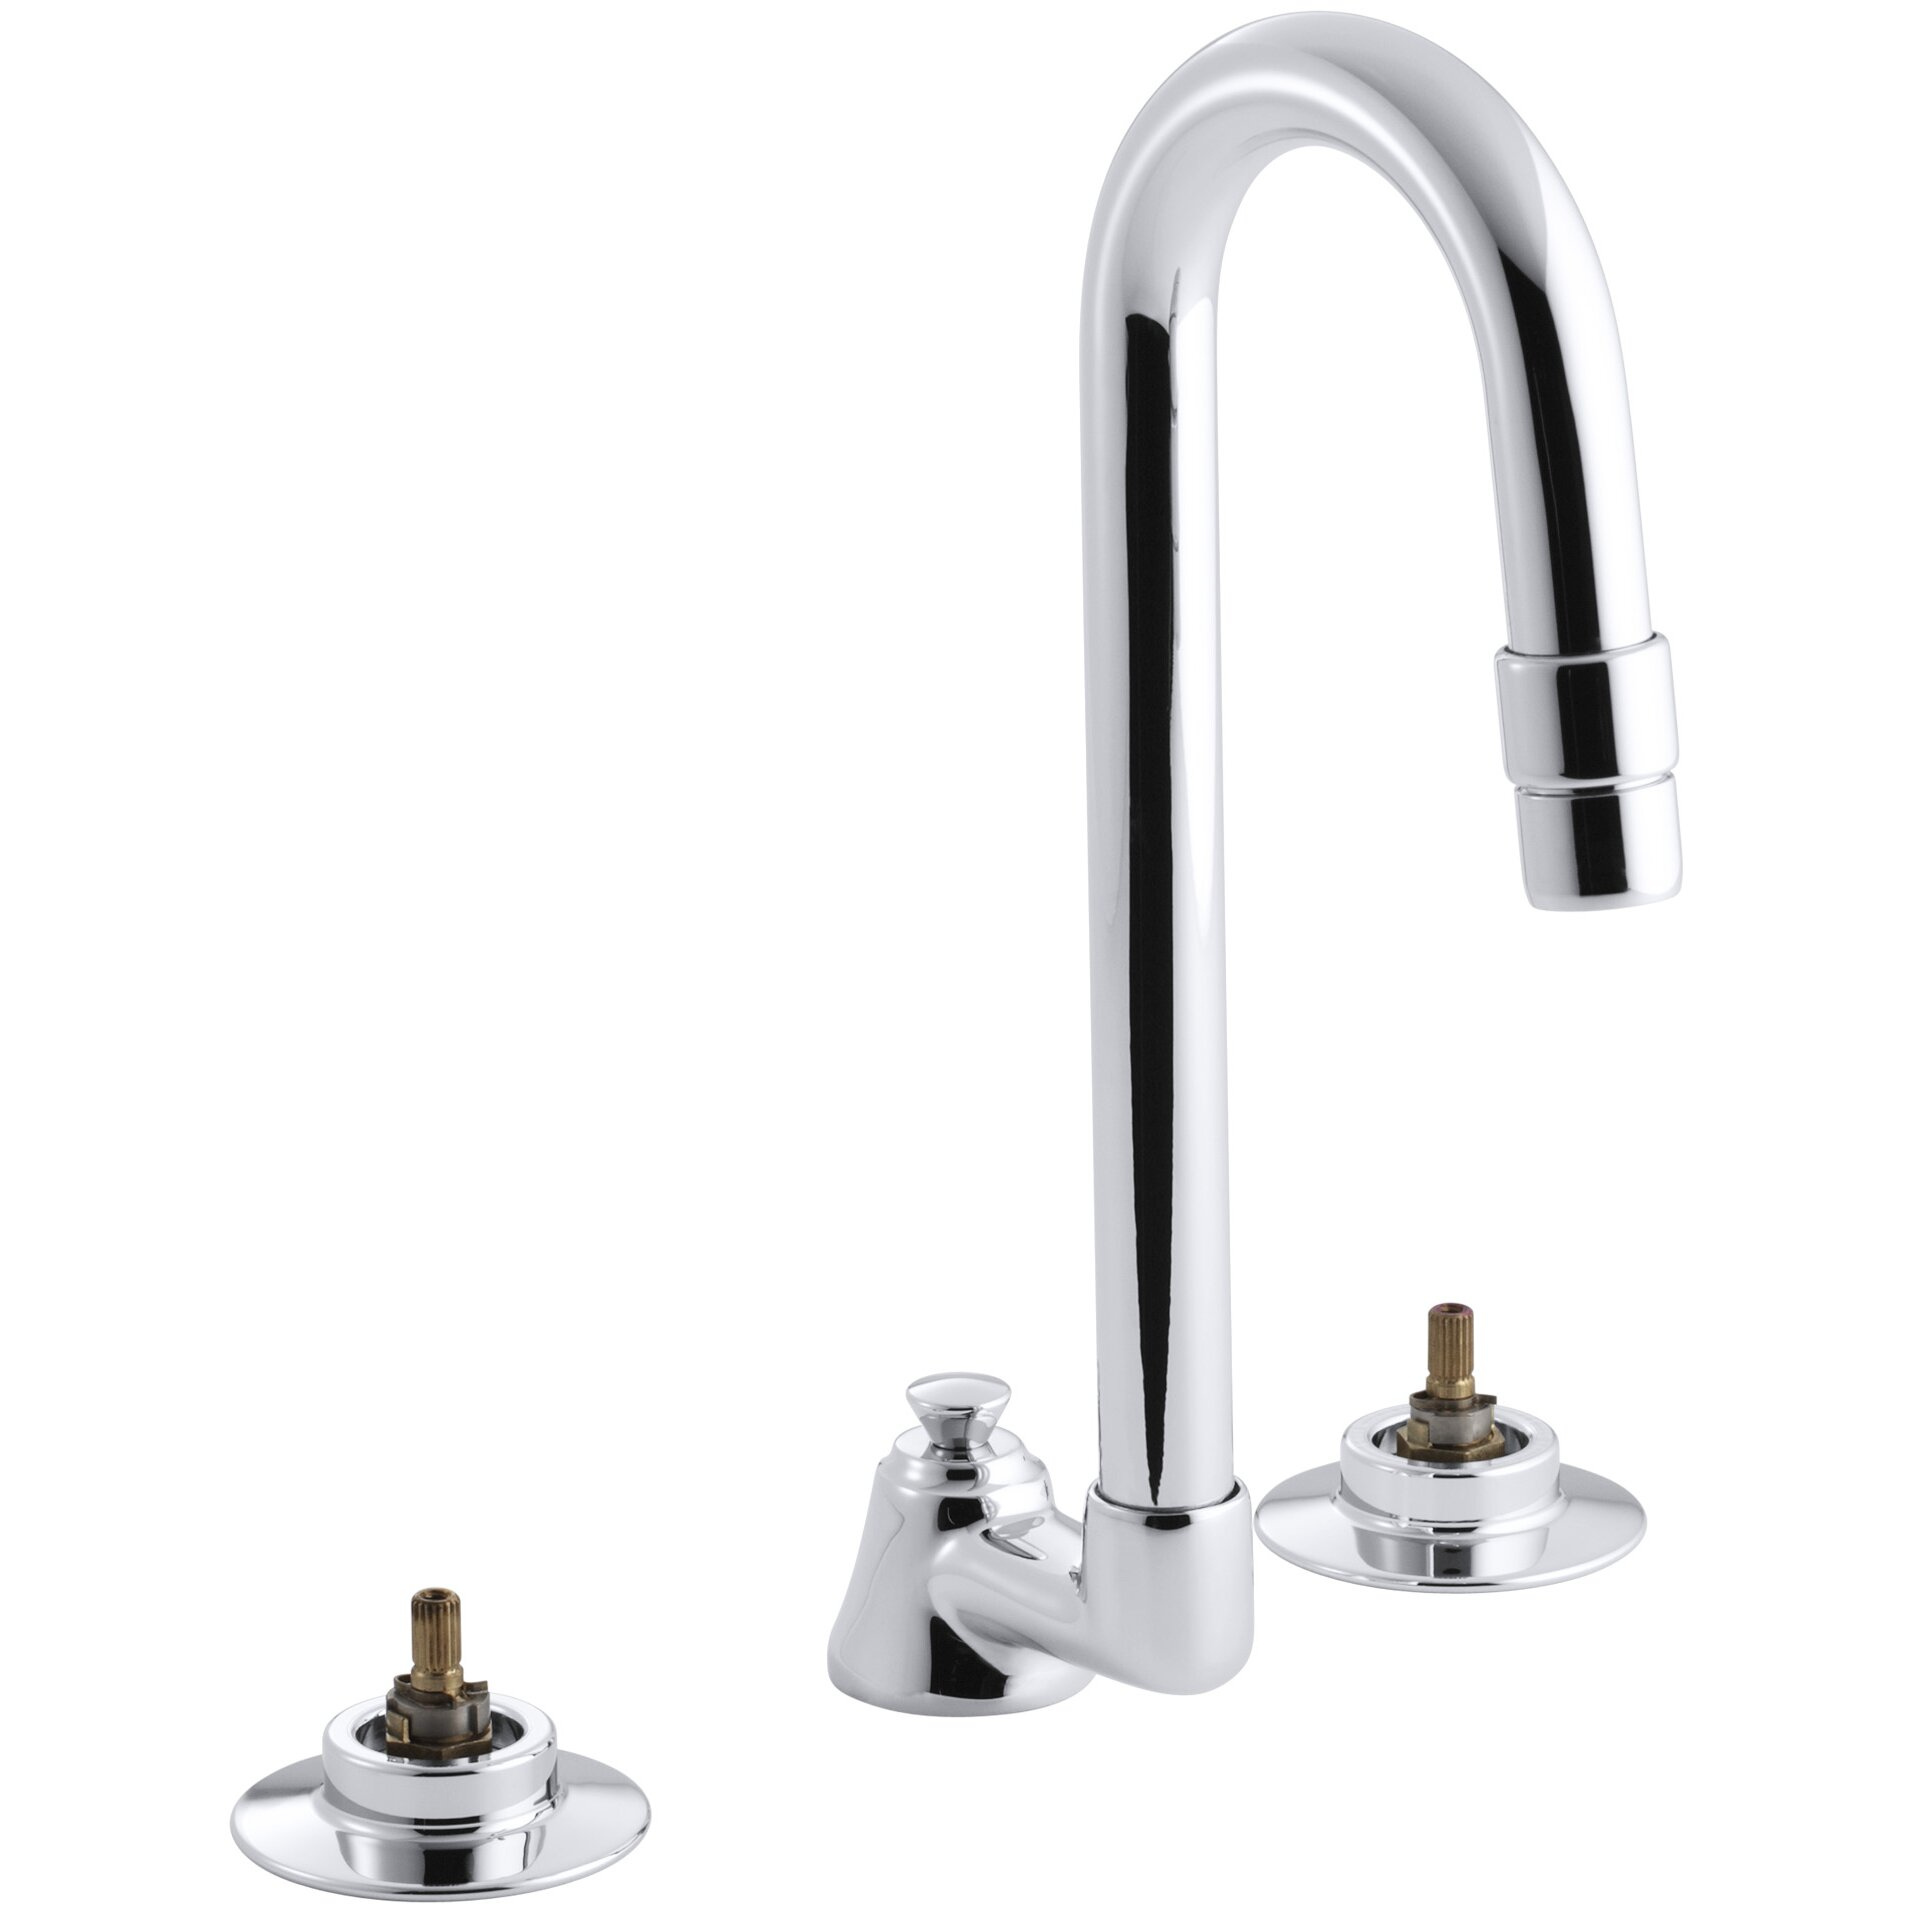 Kohler Triton Widespread Bathroom Sink Base Faucet With Pop Up Drain And Gooseneck Spout Wayfair